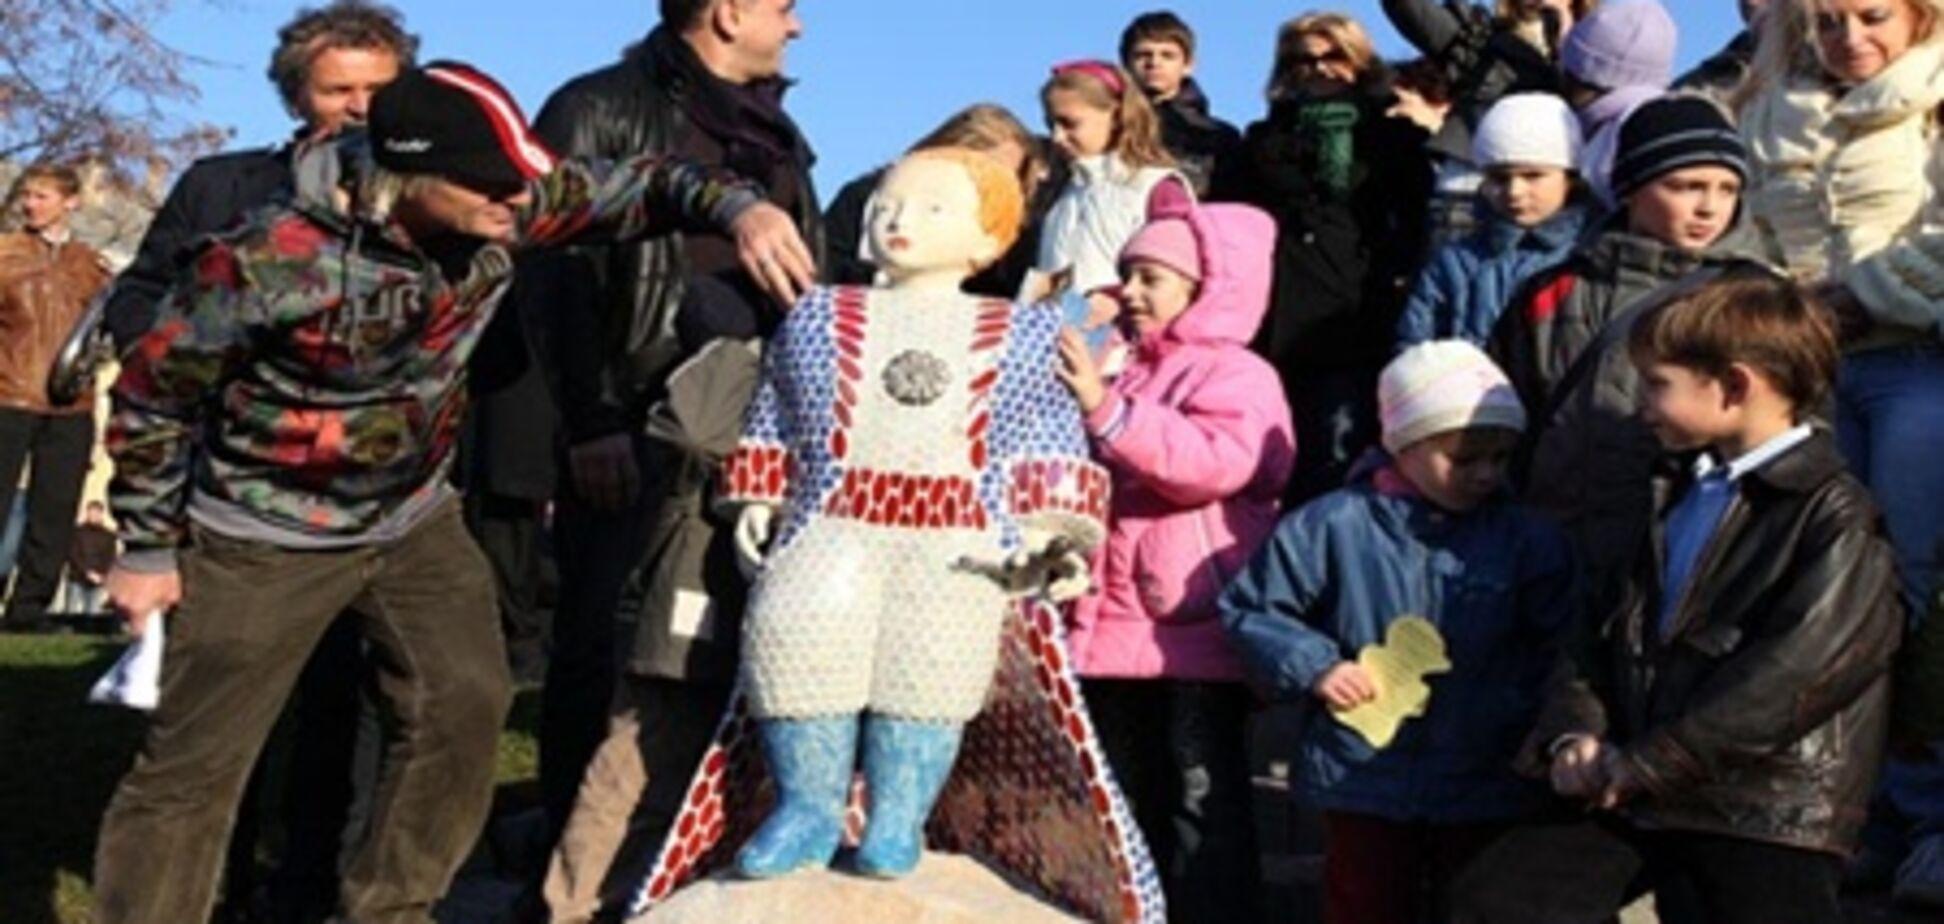 У Києві знищена скульптура Маленького принца